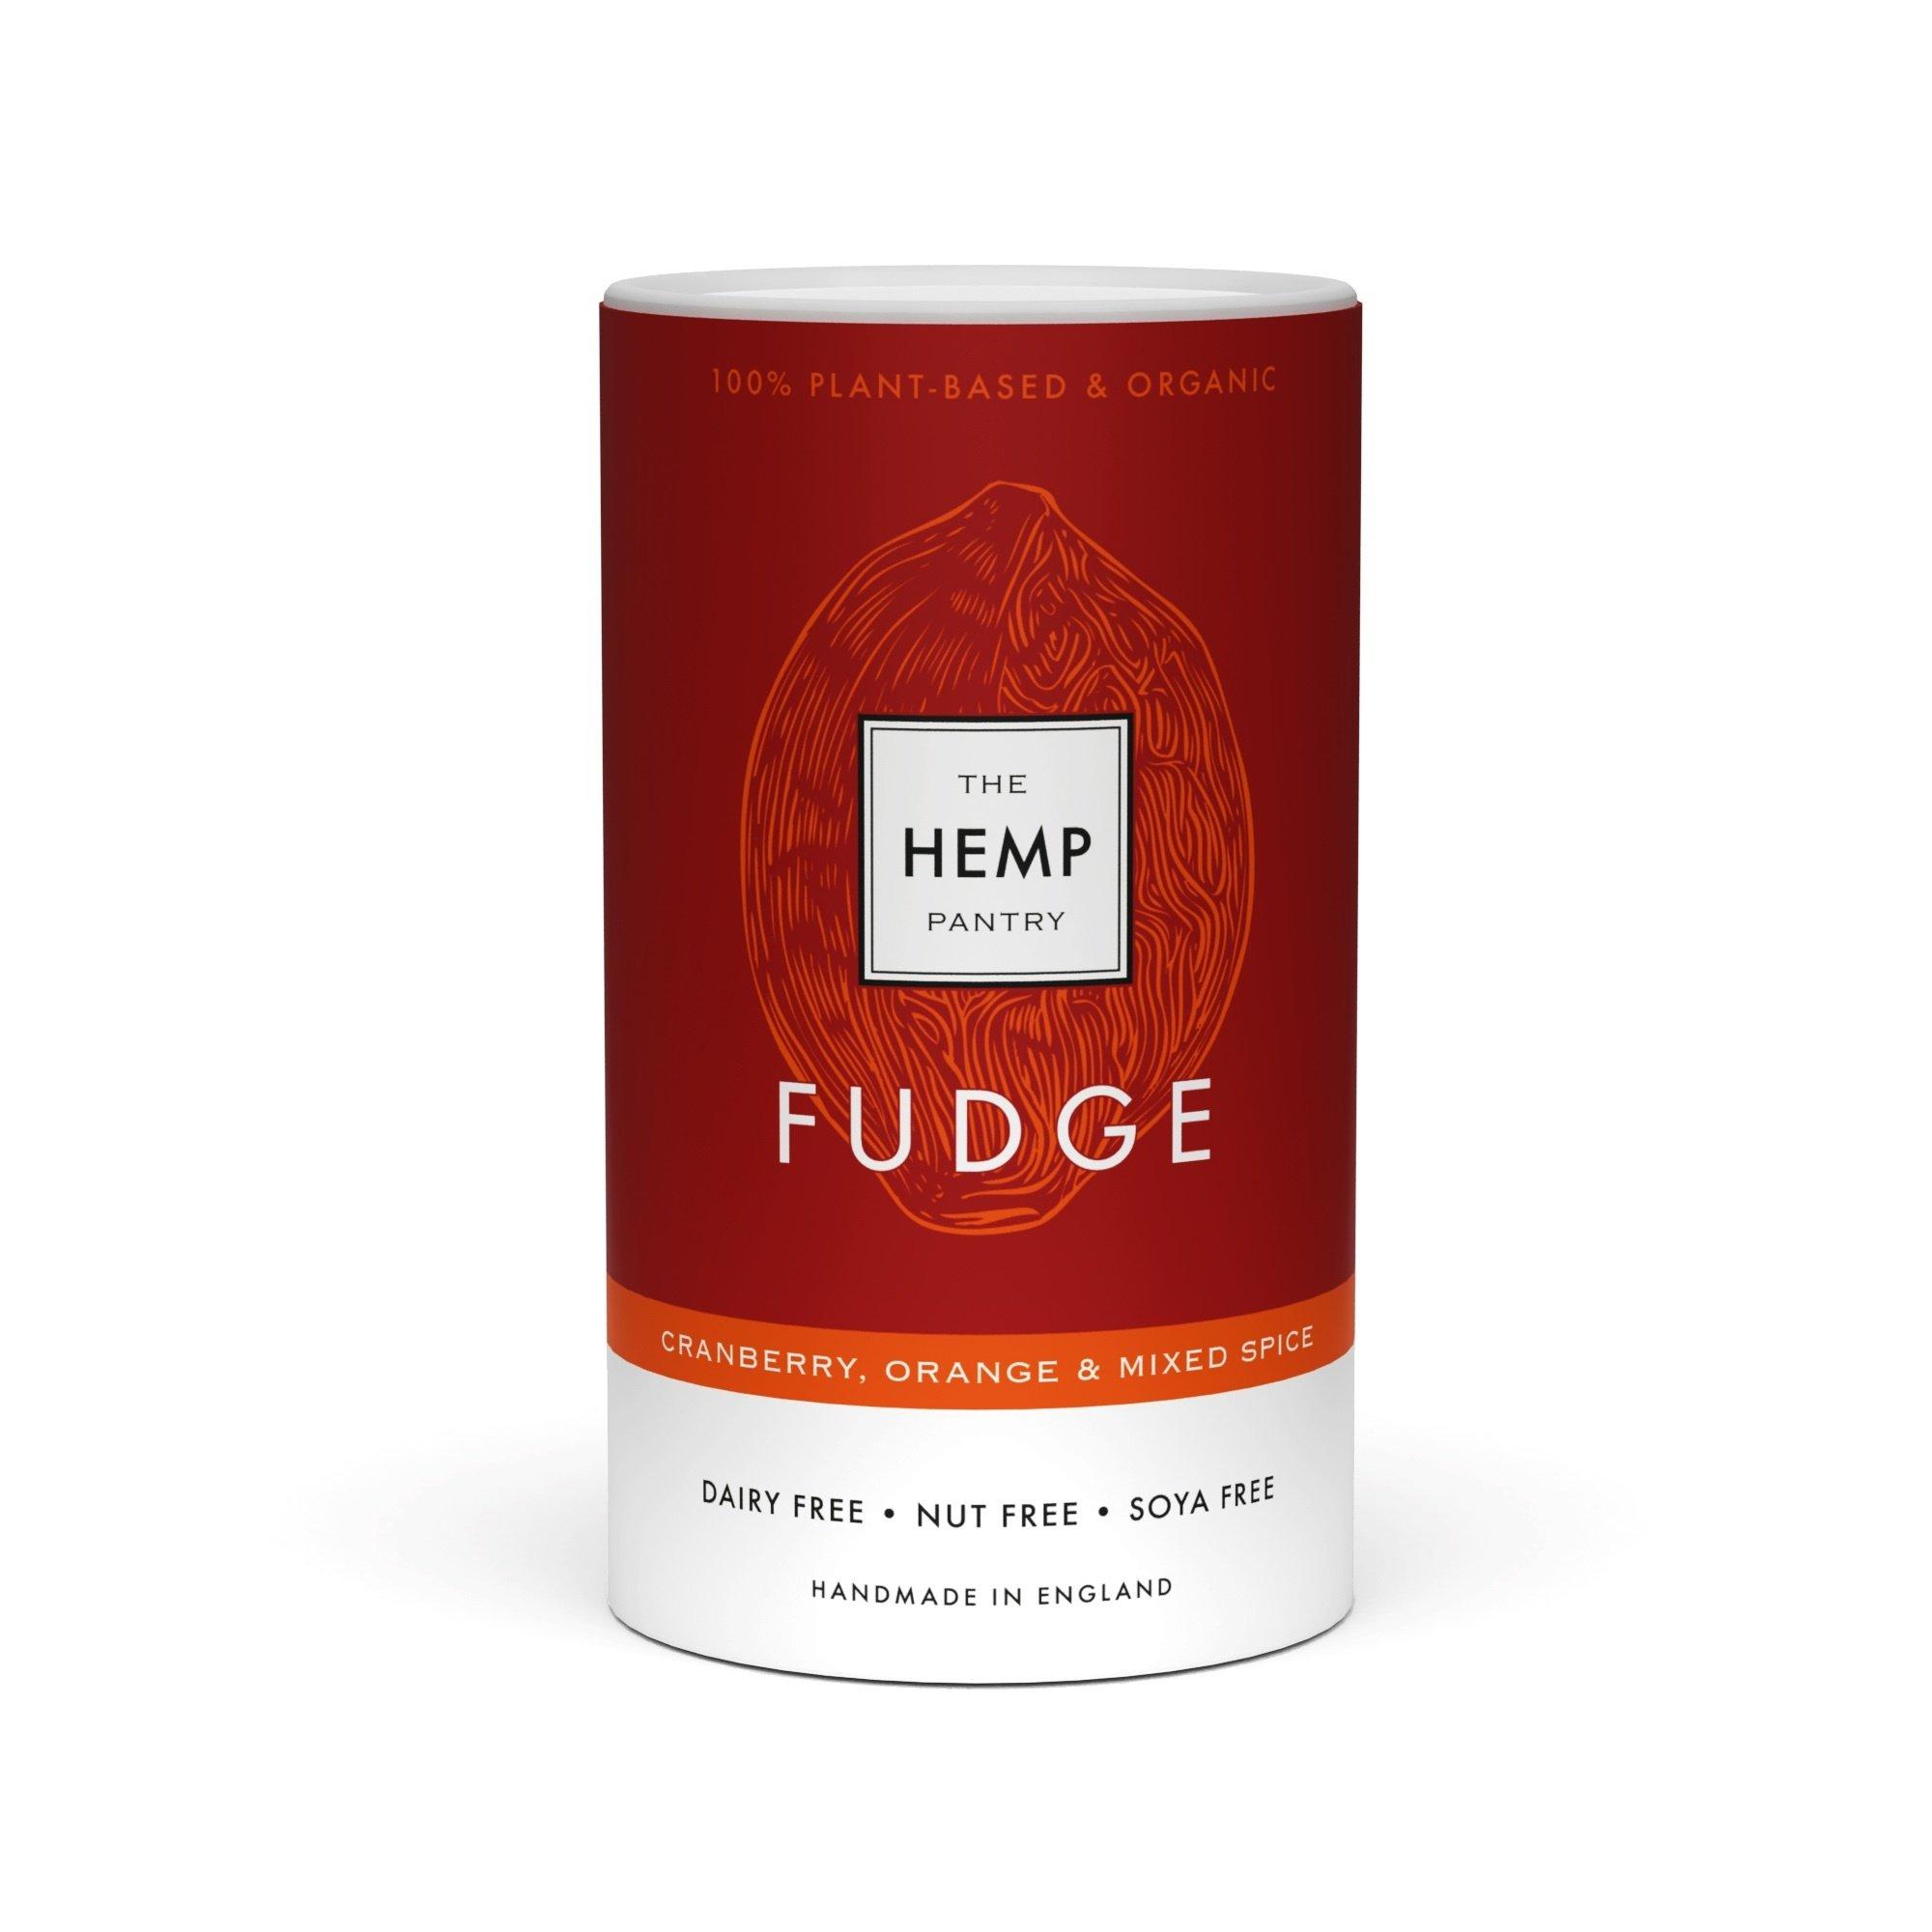 Organic Vegan Cranberry, Orange & Mixed Spice Fudge 175g Kind Shop